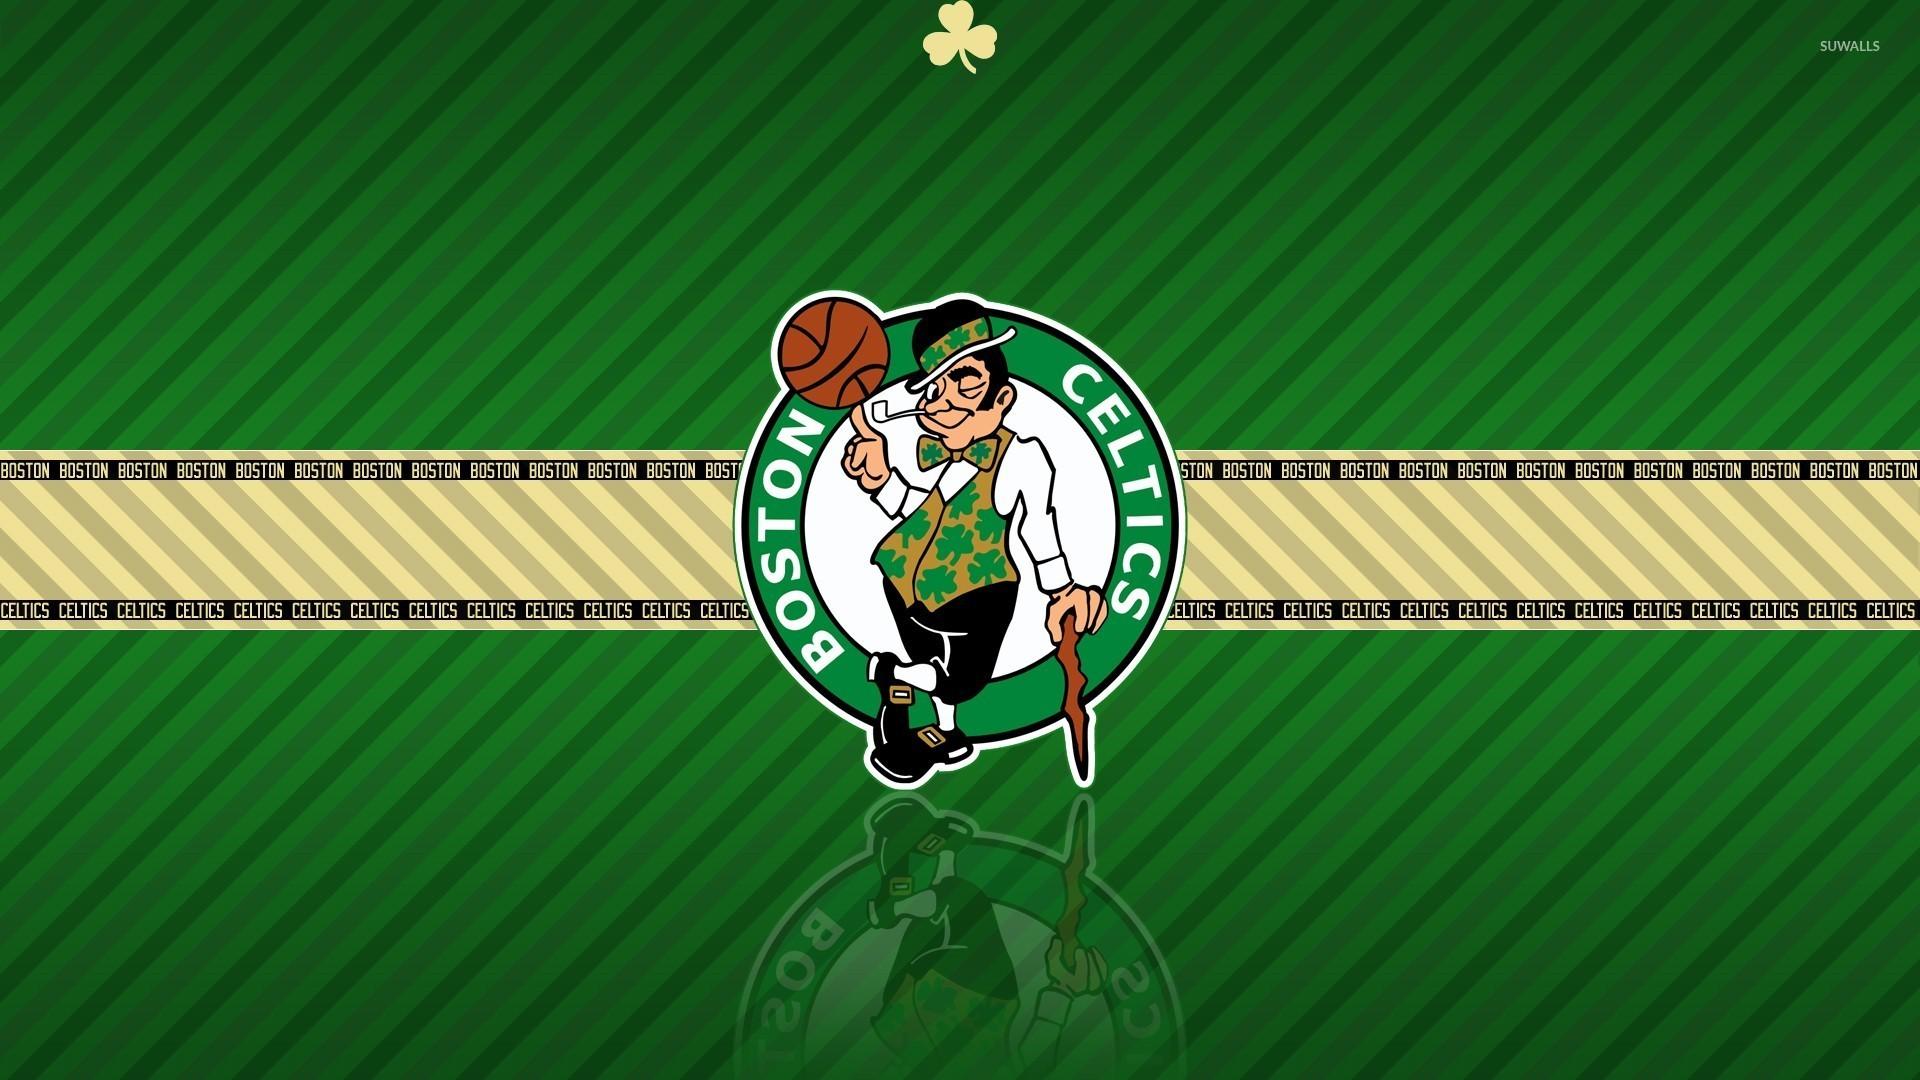 Boston Celtics logo wallpaper jpg